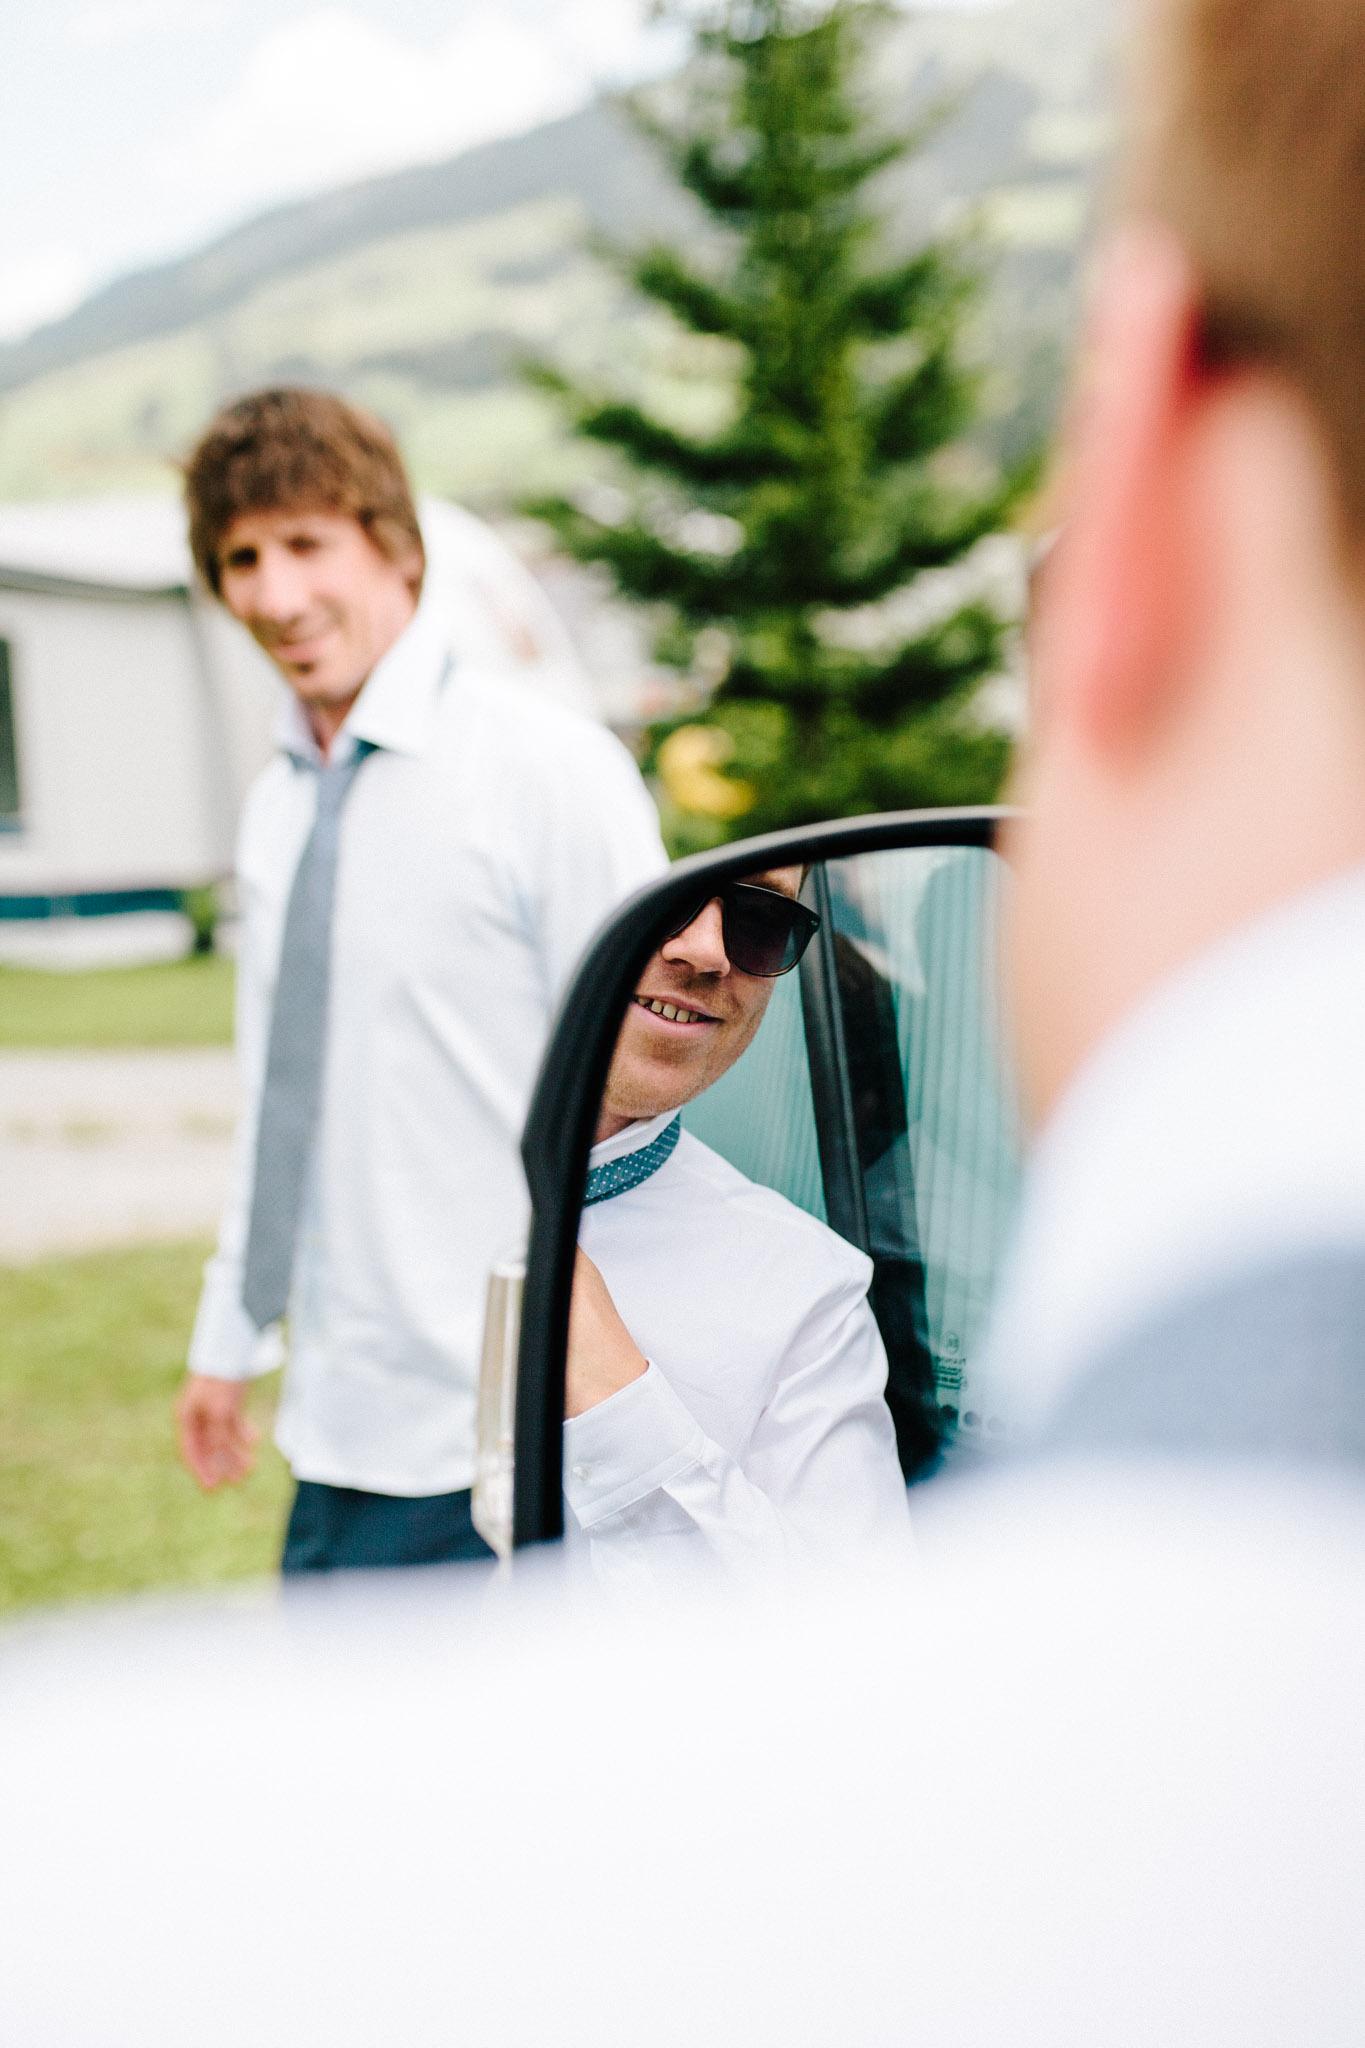 Lenl-Simmental-Buehlerhof-Pia-Anna-Christian-Wedding-Photography-EK-17.jpg